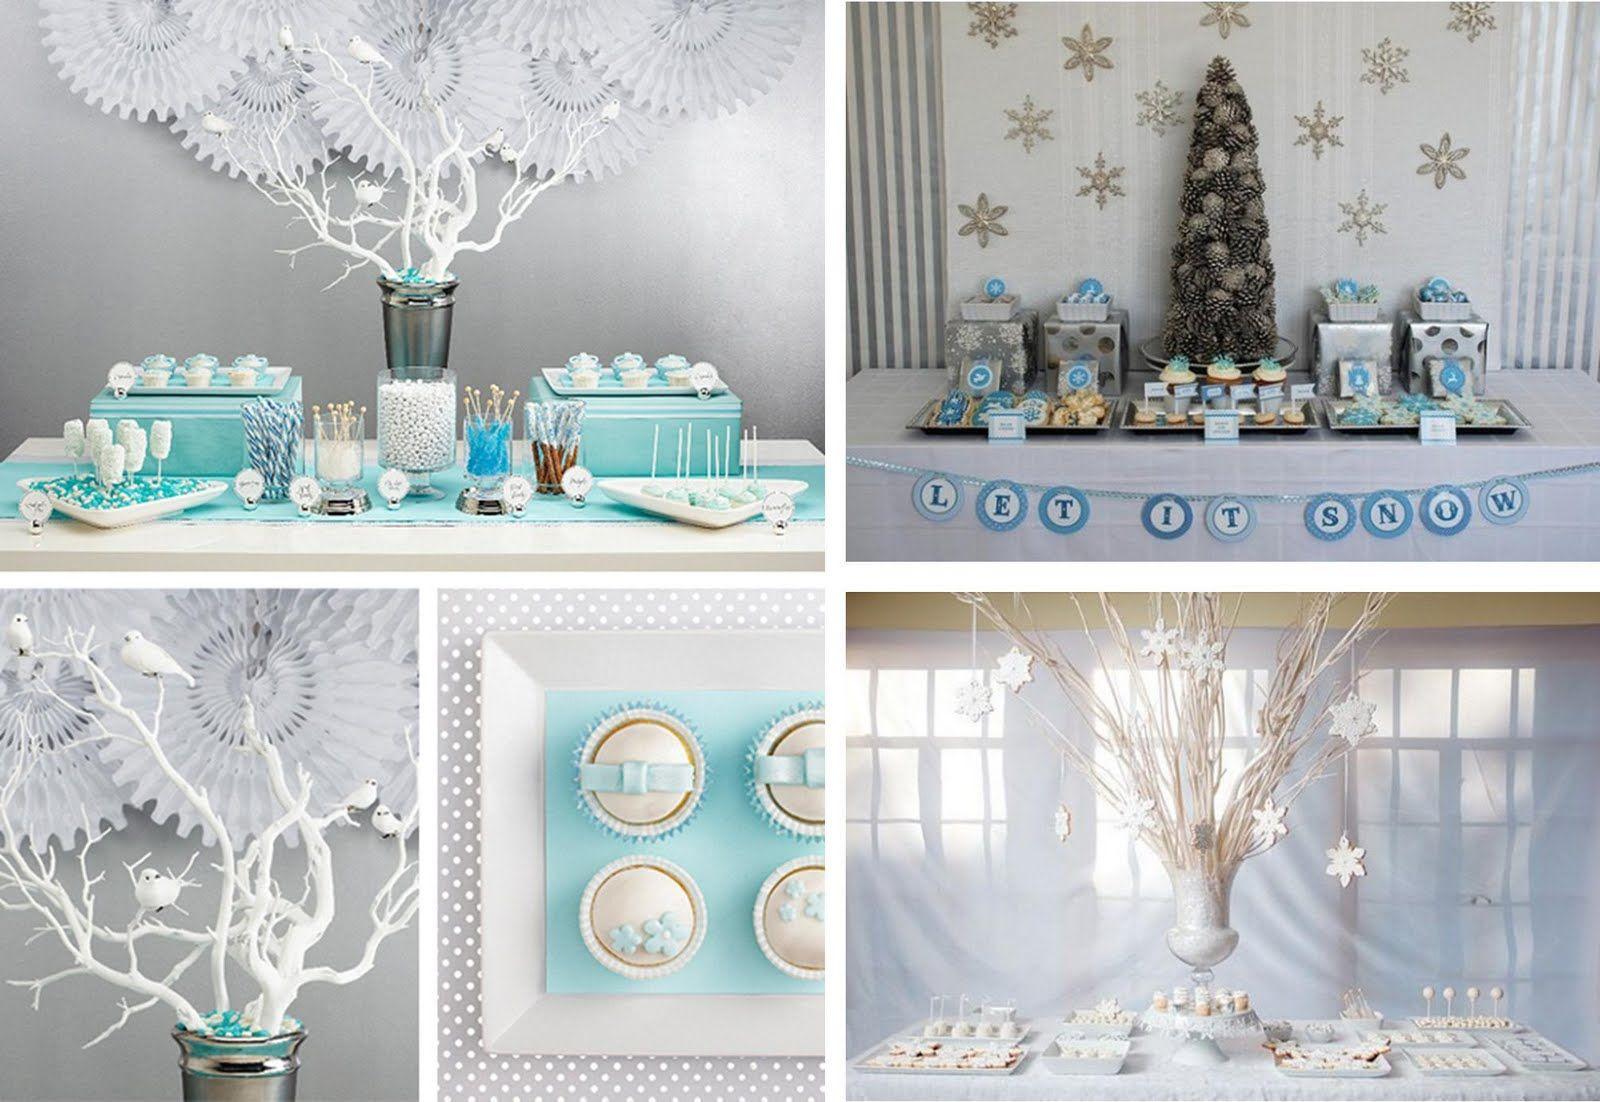 Winter-Wonderland-2.jpg 1600×1102 pixels | Surprise Christmas party ...